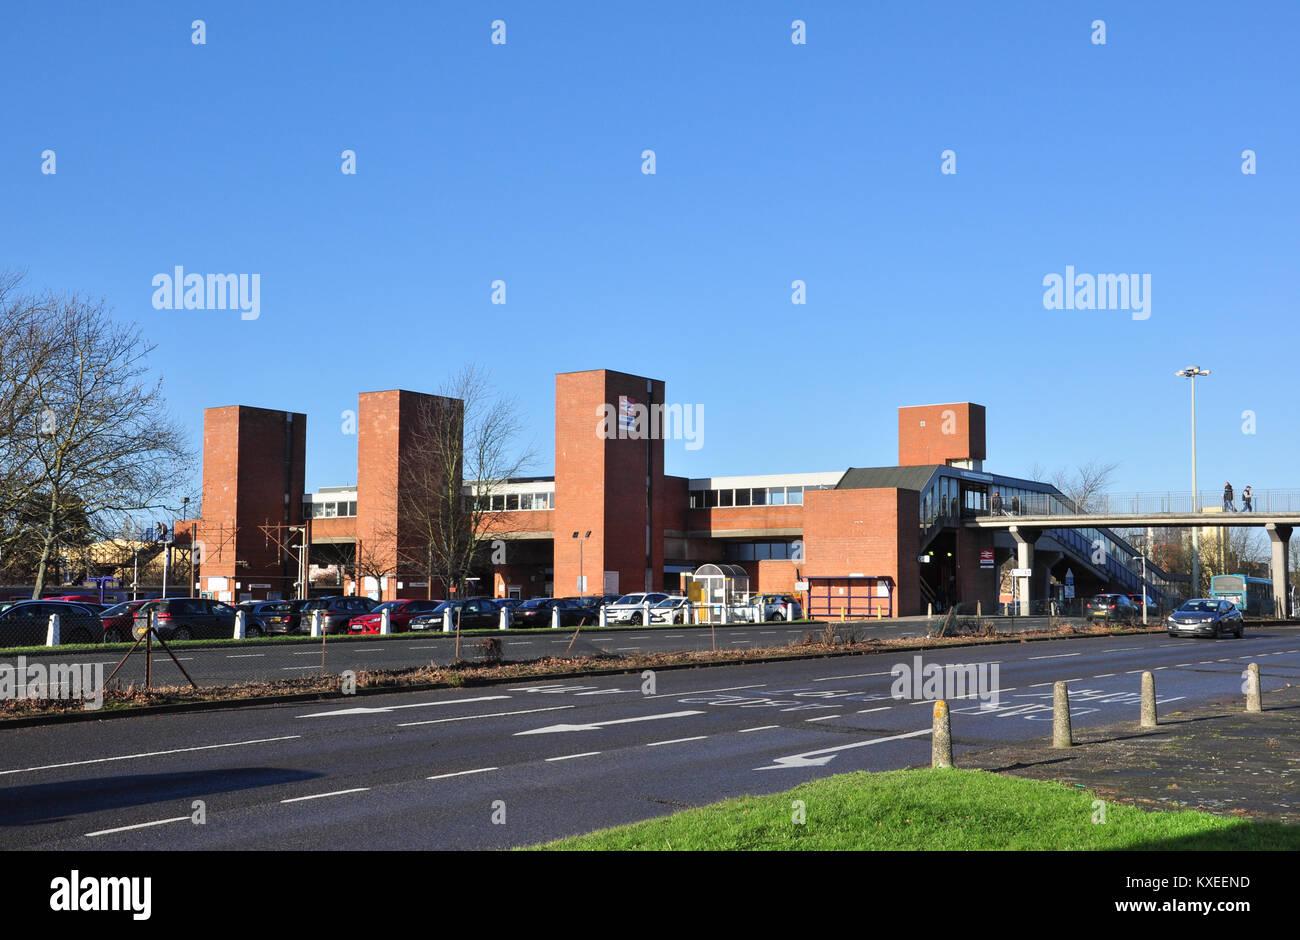 Red brick railway station exterior, Lytton Way, Stevenage, Hertfordshire, England, UK - Stock Image